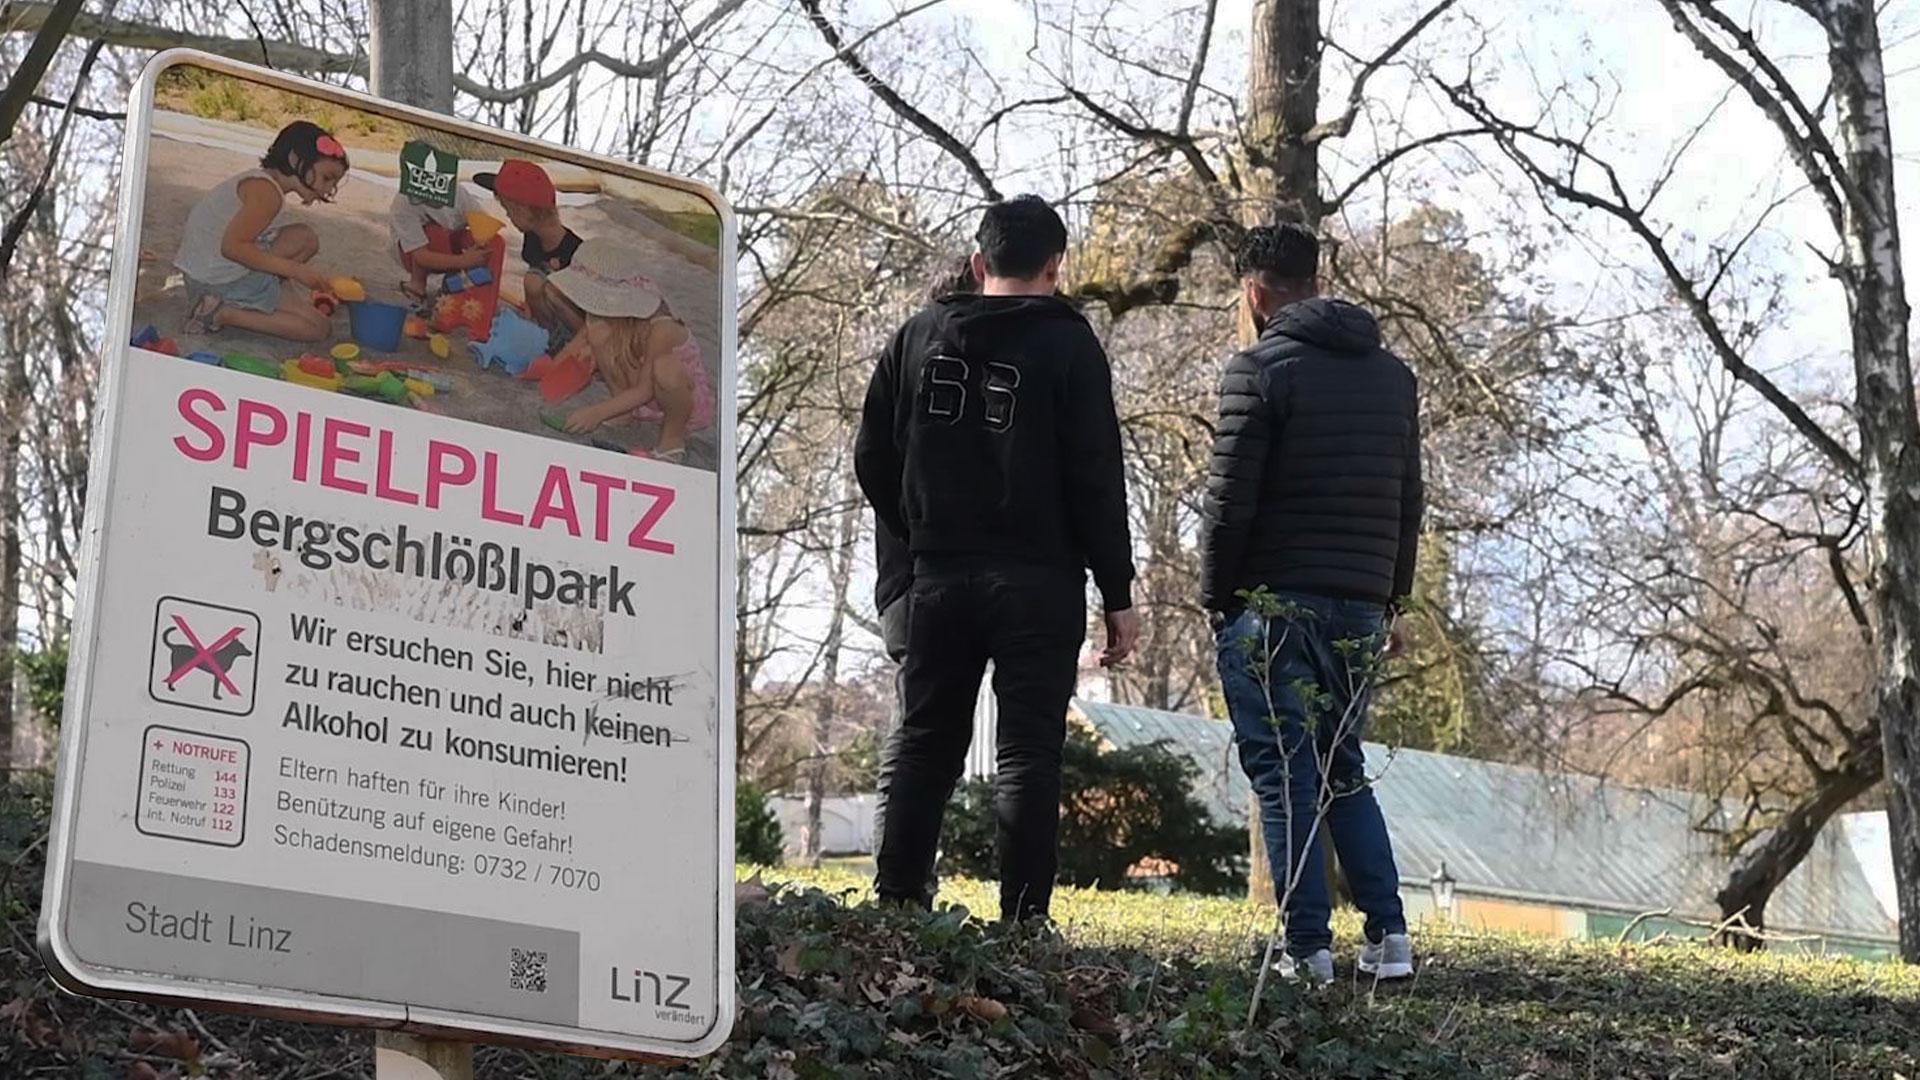 Drogenabhängige Sollen In Bergschlössl Park Lt 1 Oö Größter